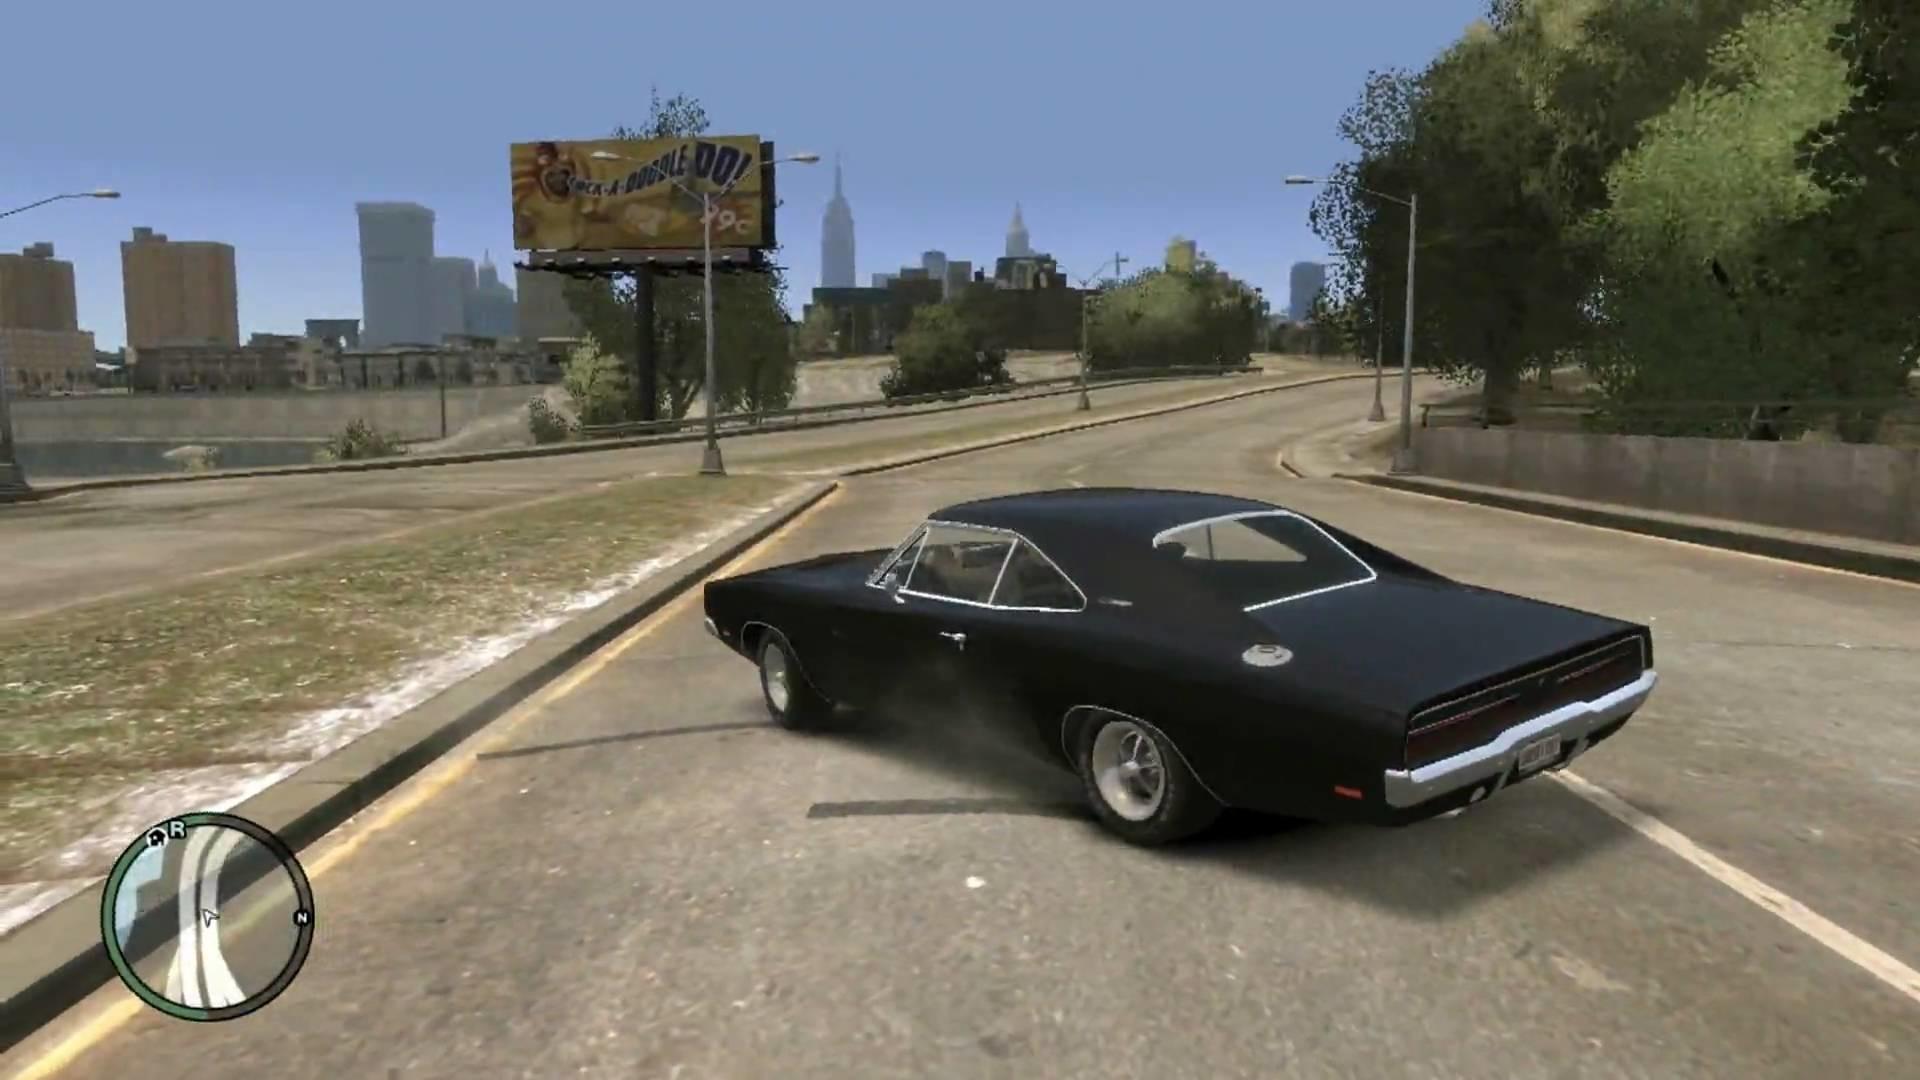 GTA IV [PC] – 1969 Dodge Charger Mod (HD) – YouTube